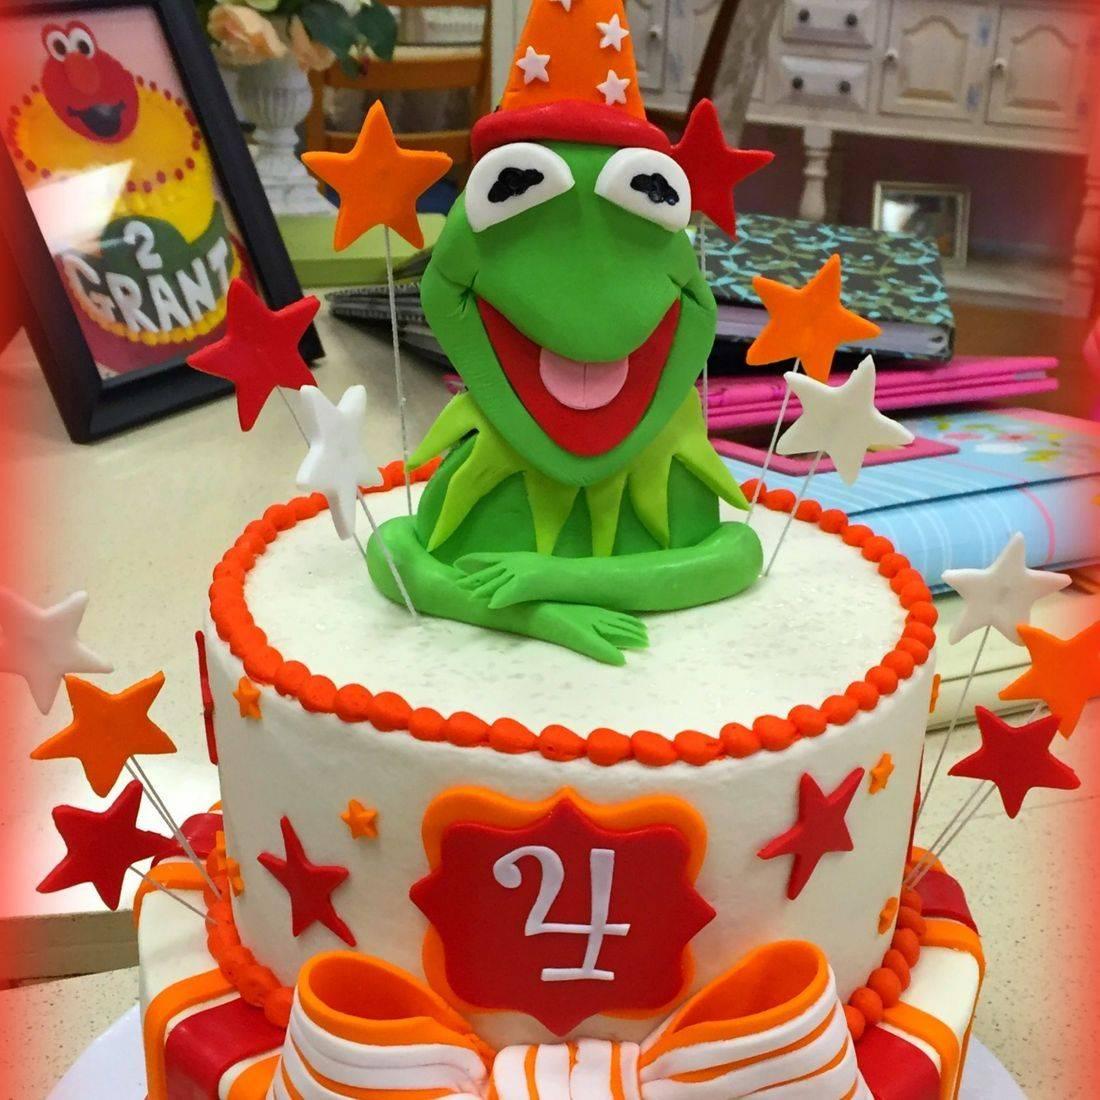 Kermit the Frog birthday cake muppets cake frog cake